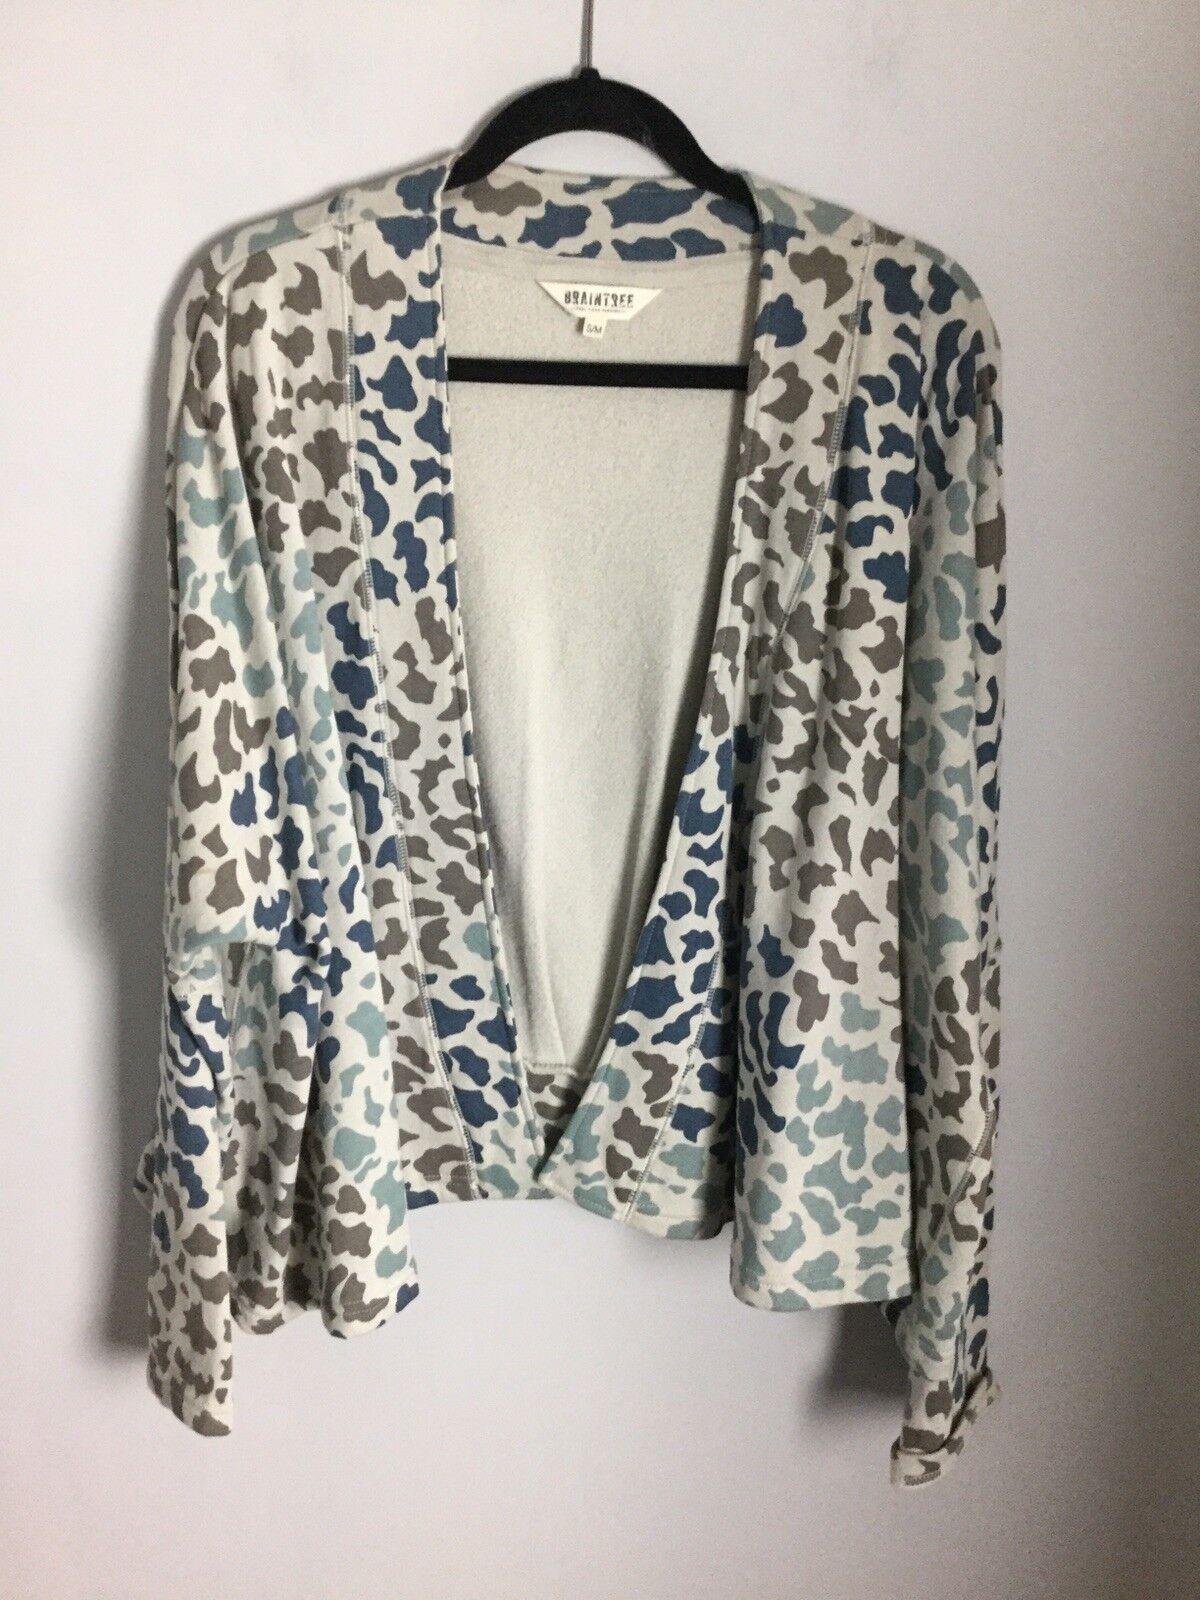 Braintree Pale bluee Cotton Open Cardigan. Size S M (14-16UK). Ex Condition